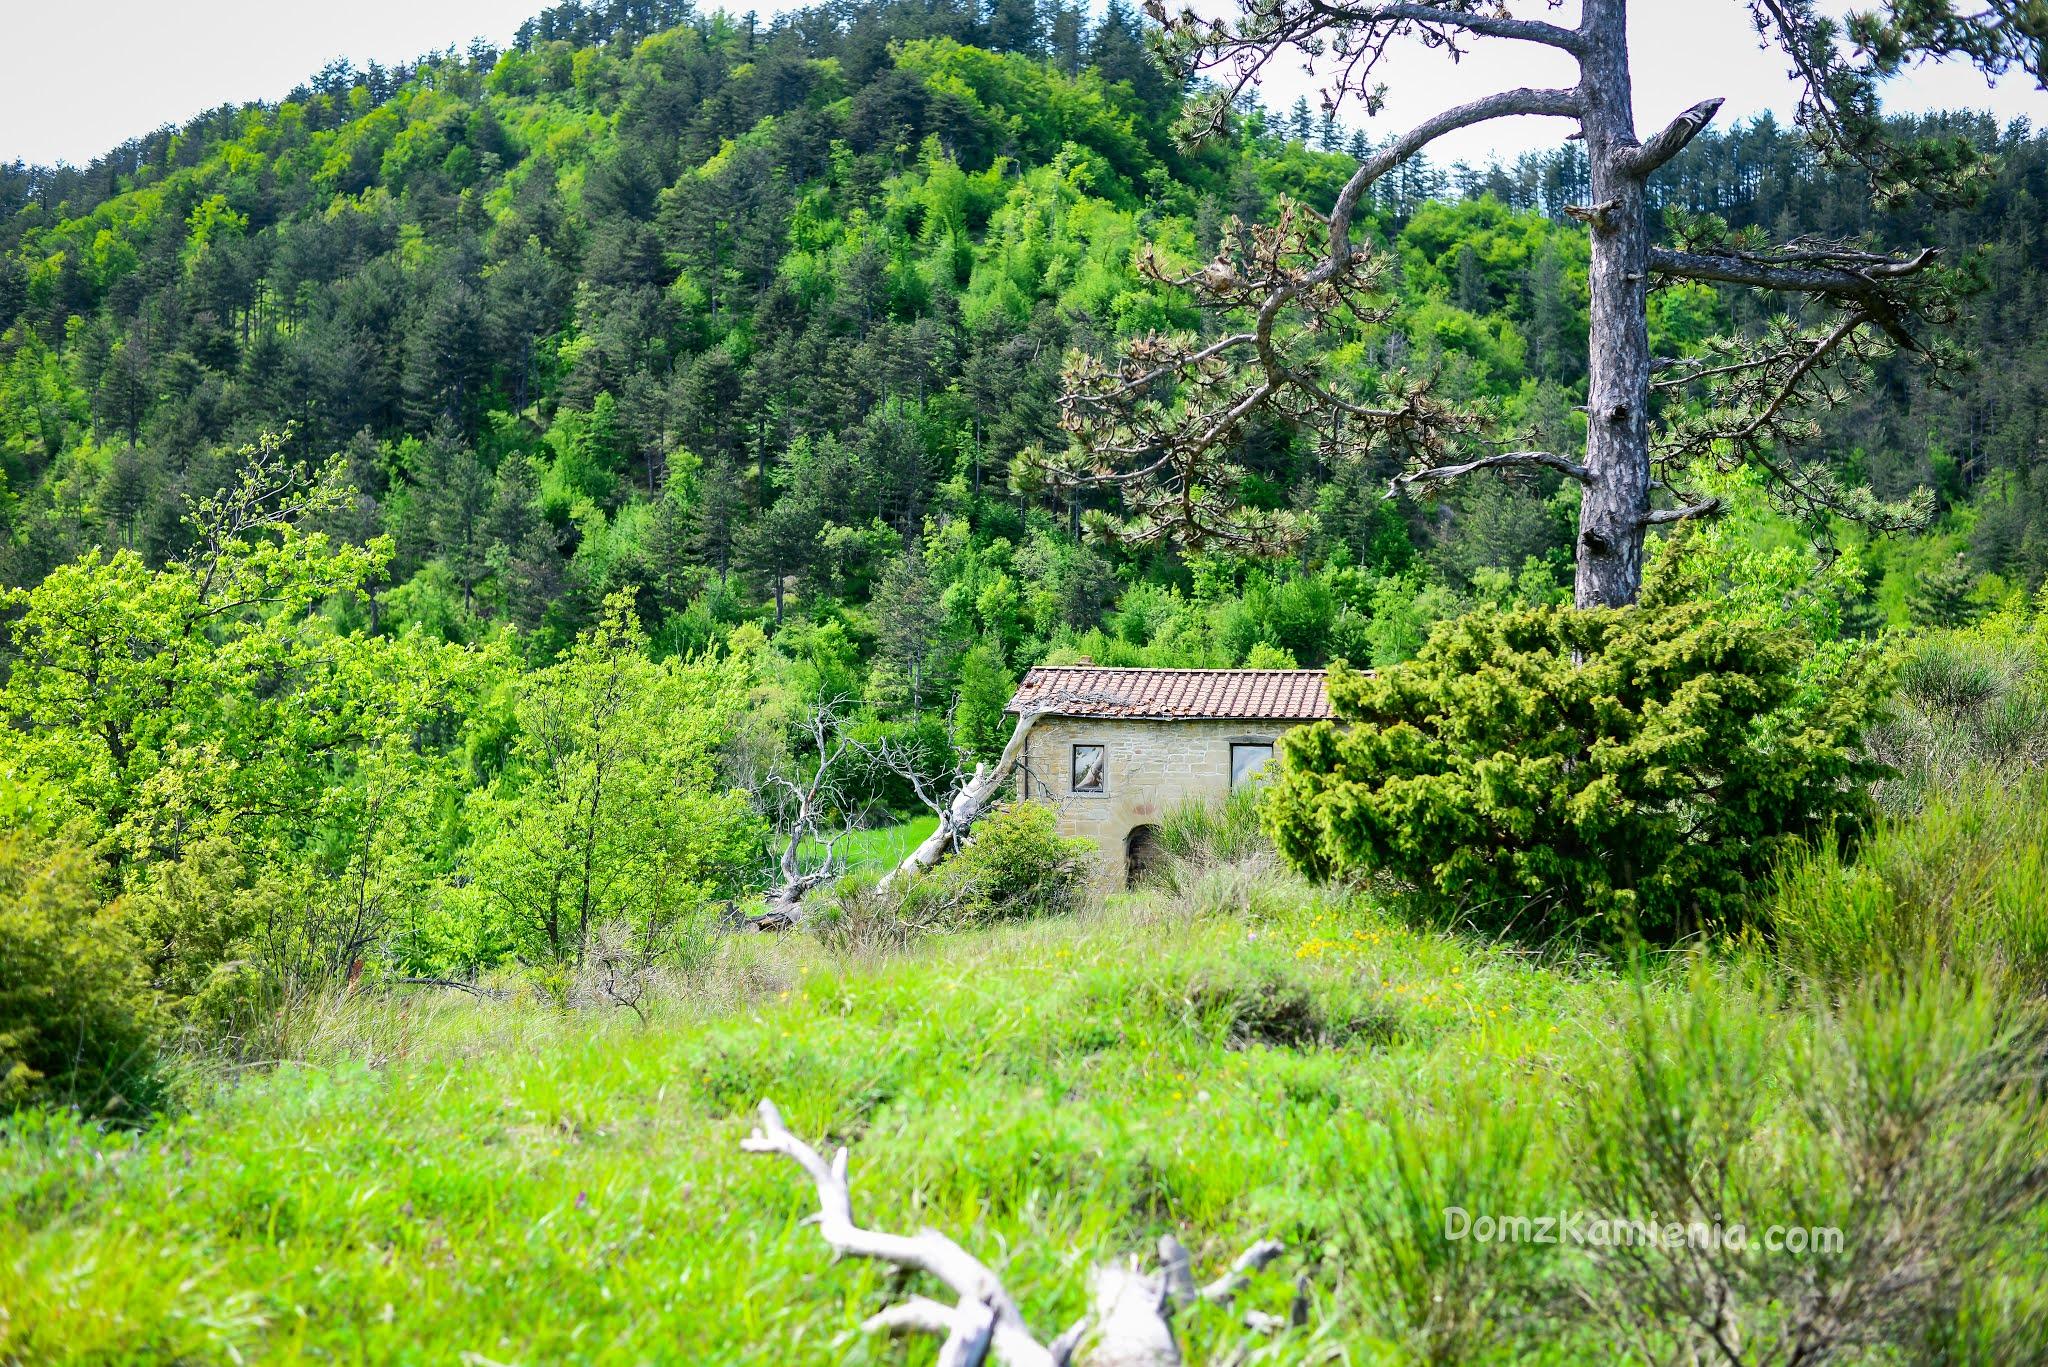 Dom z Kamienia blog, Marradi, Gamberaldi